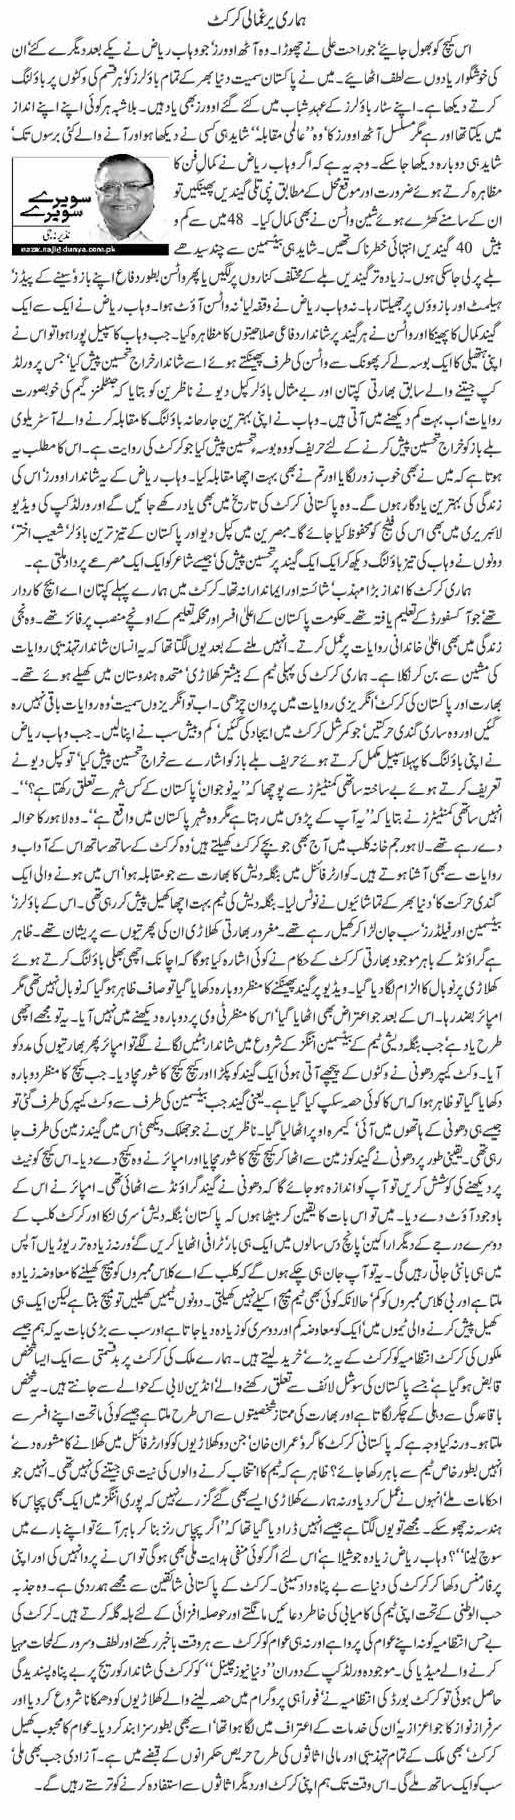 Hamari Yarghamali Cricket By Nazir Naji - Pakfunny